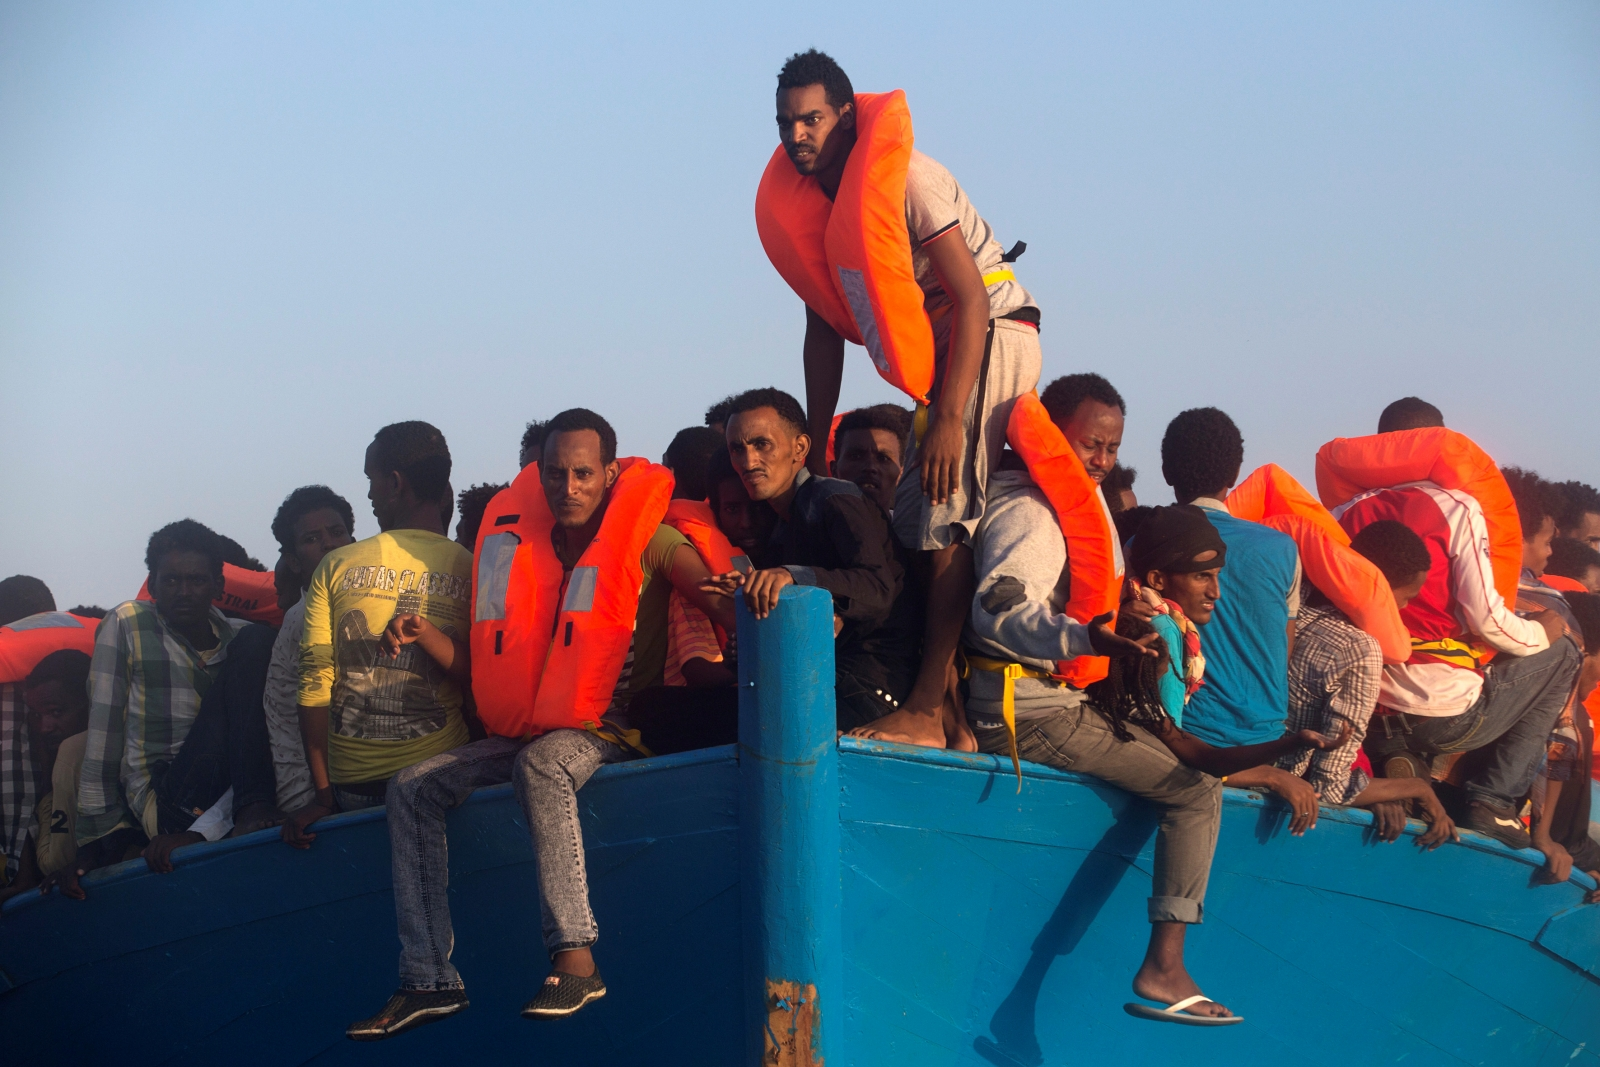 Migrants from Eritrea